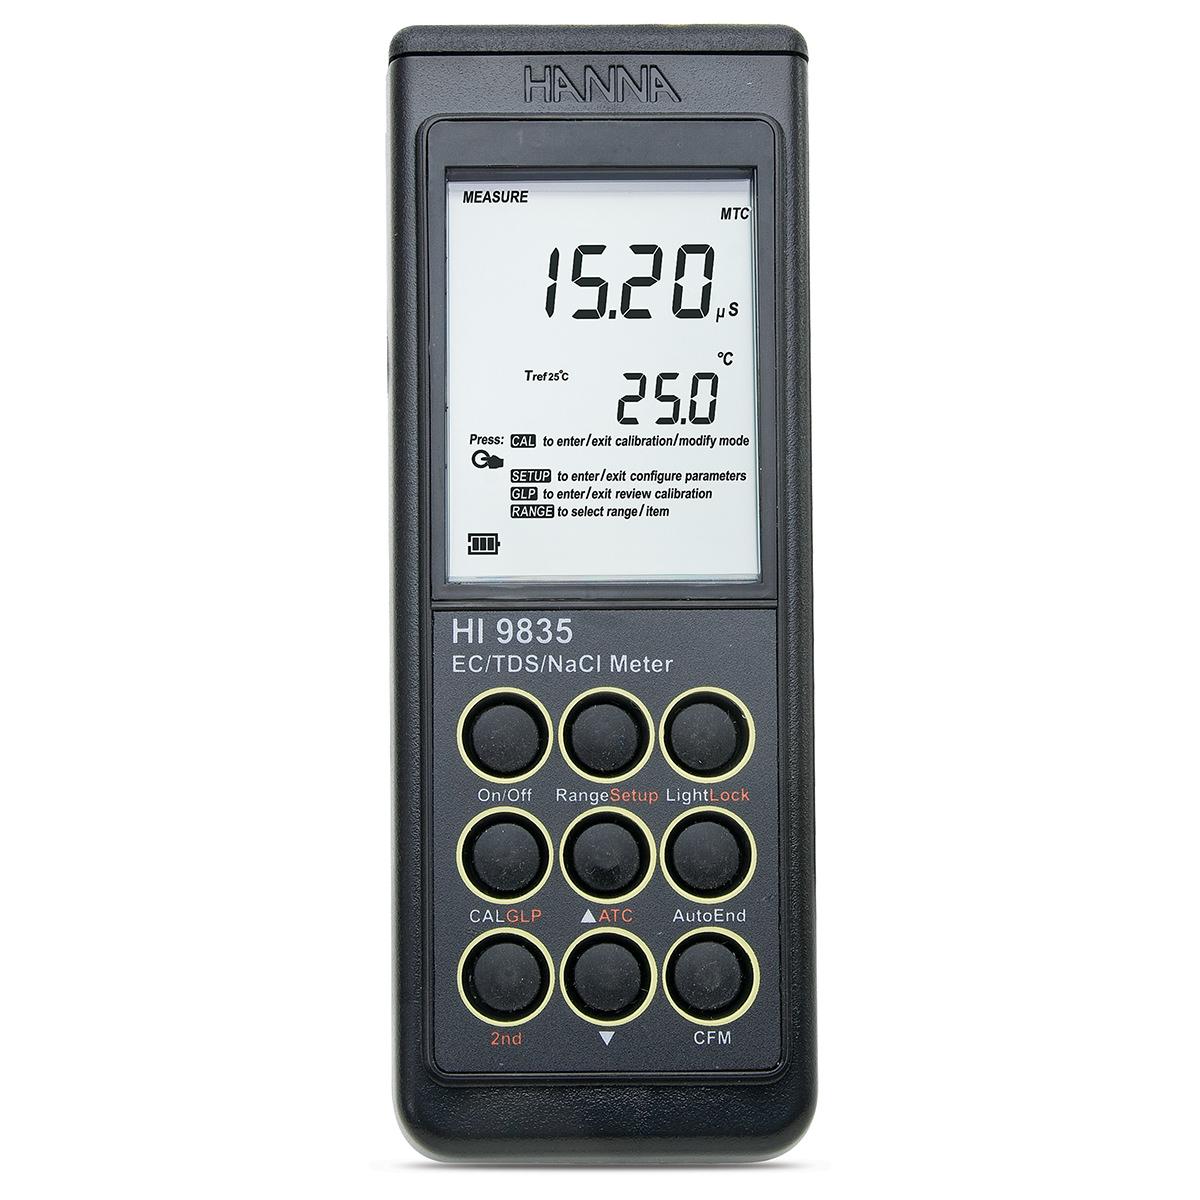 Medidor Portátil para CE / TDS / NaCl / °C - HI9835